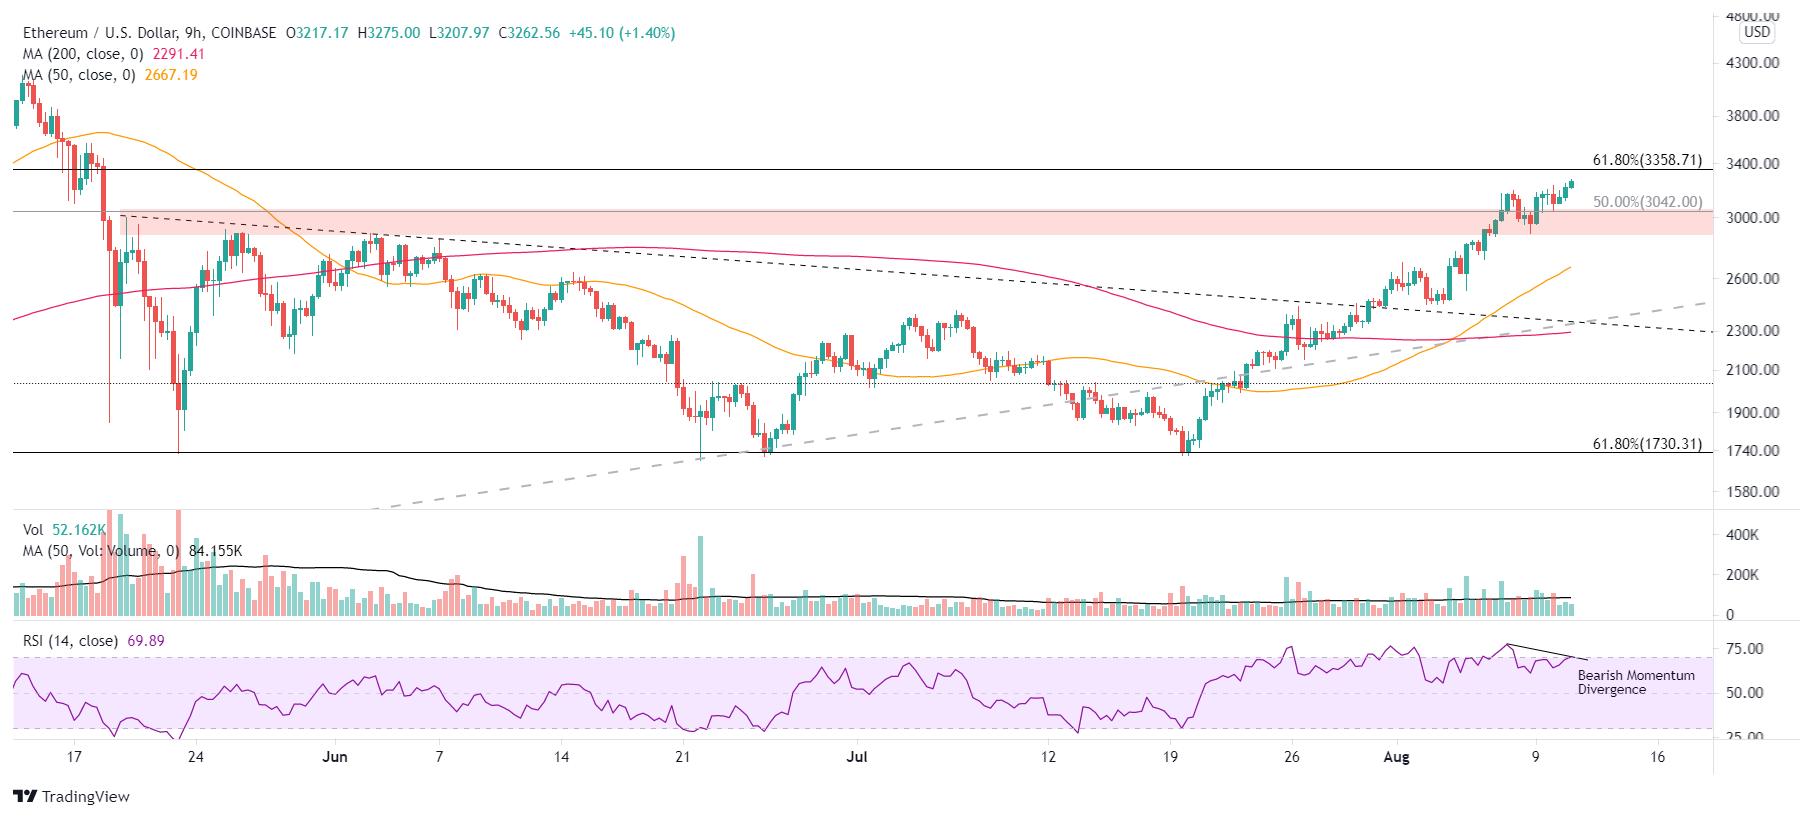 BTC/USD 9-hour chart